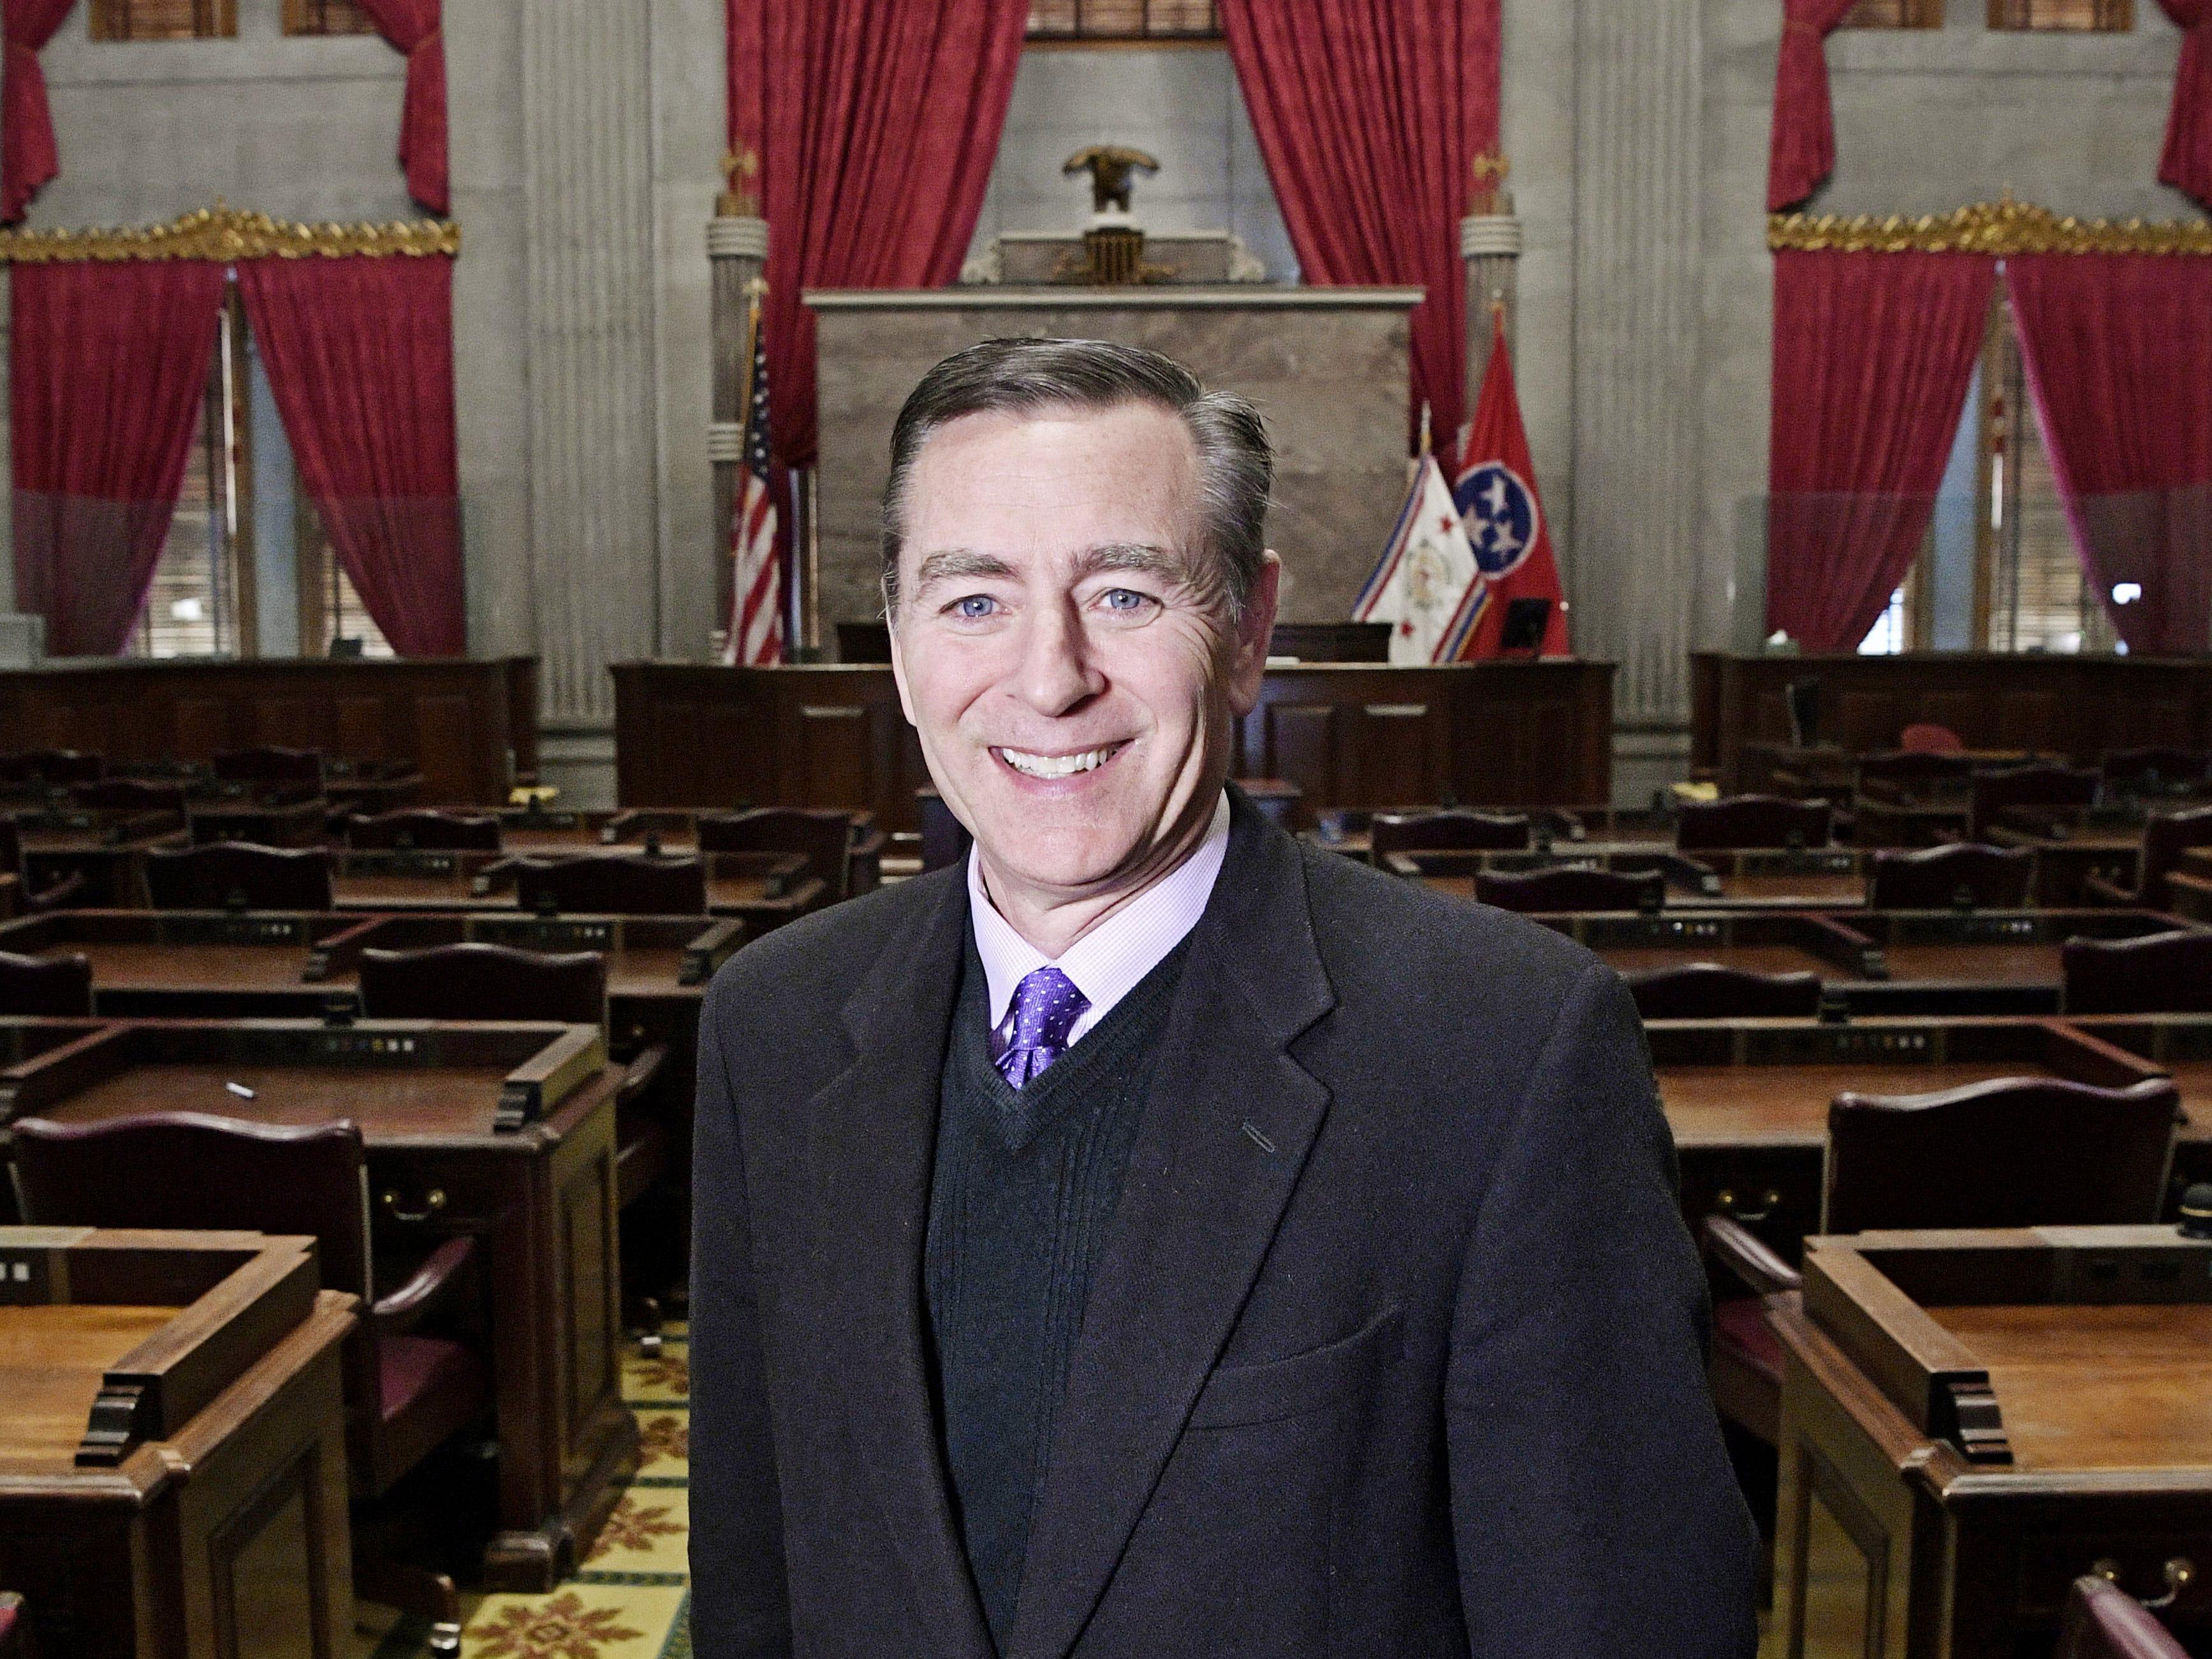 Rep. Glen Casada may soon be the next House speaker.